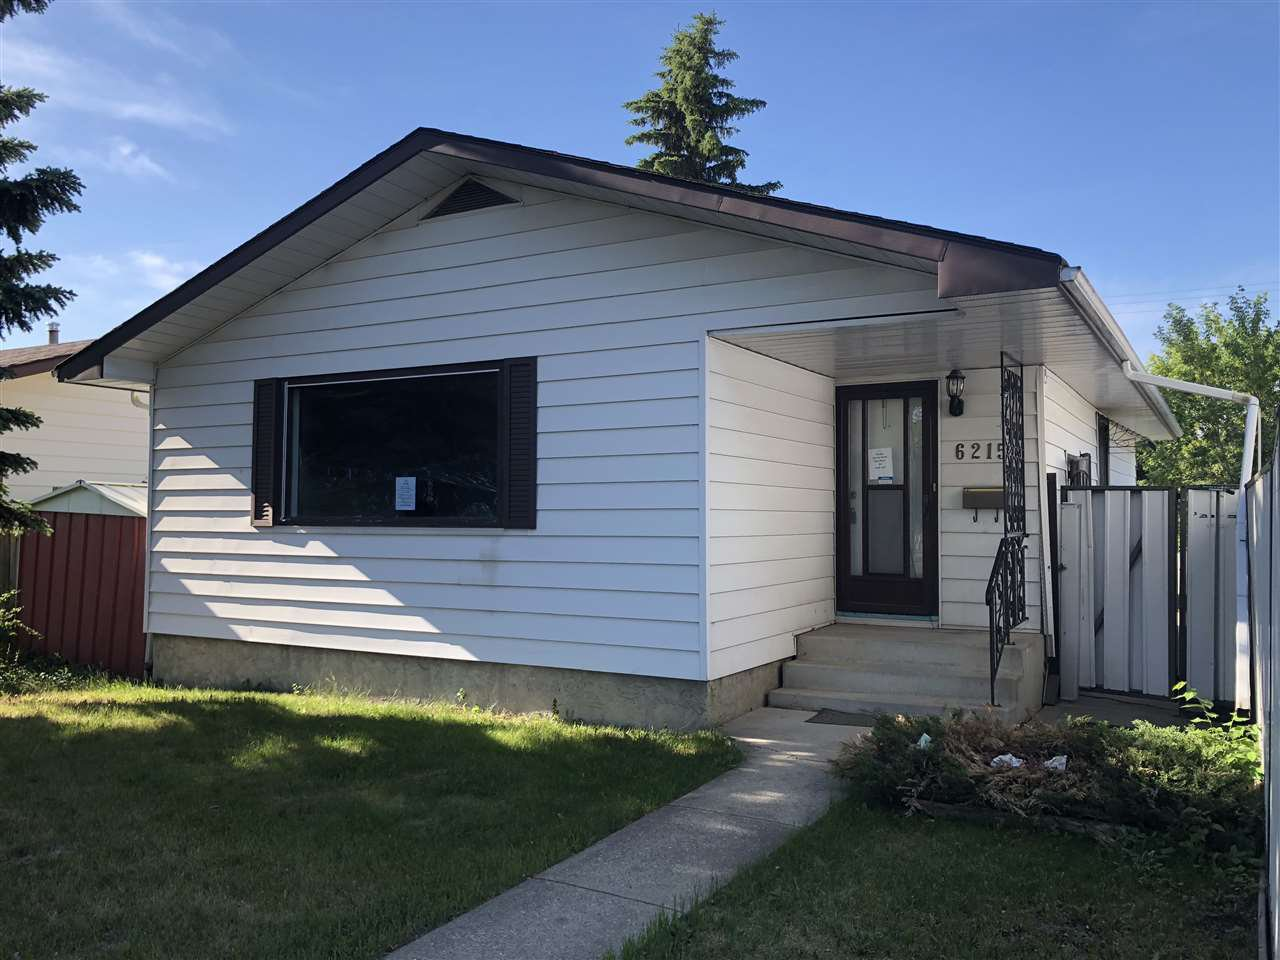 Main Photo: 6215 137 Avenue in Edmonton: Zone 02 House for sale : MLS®# E4173250